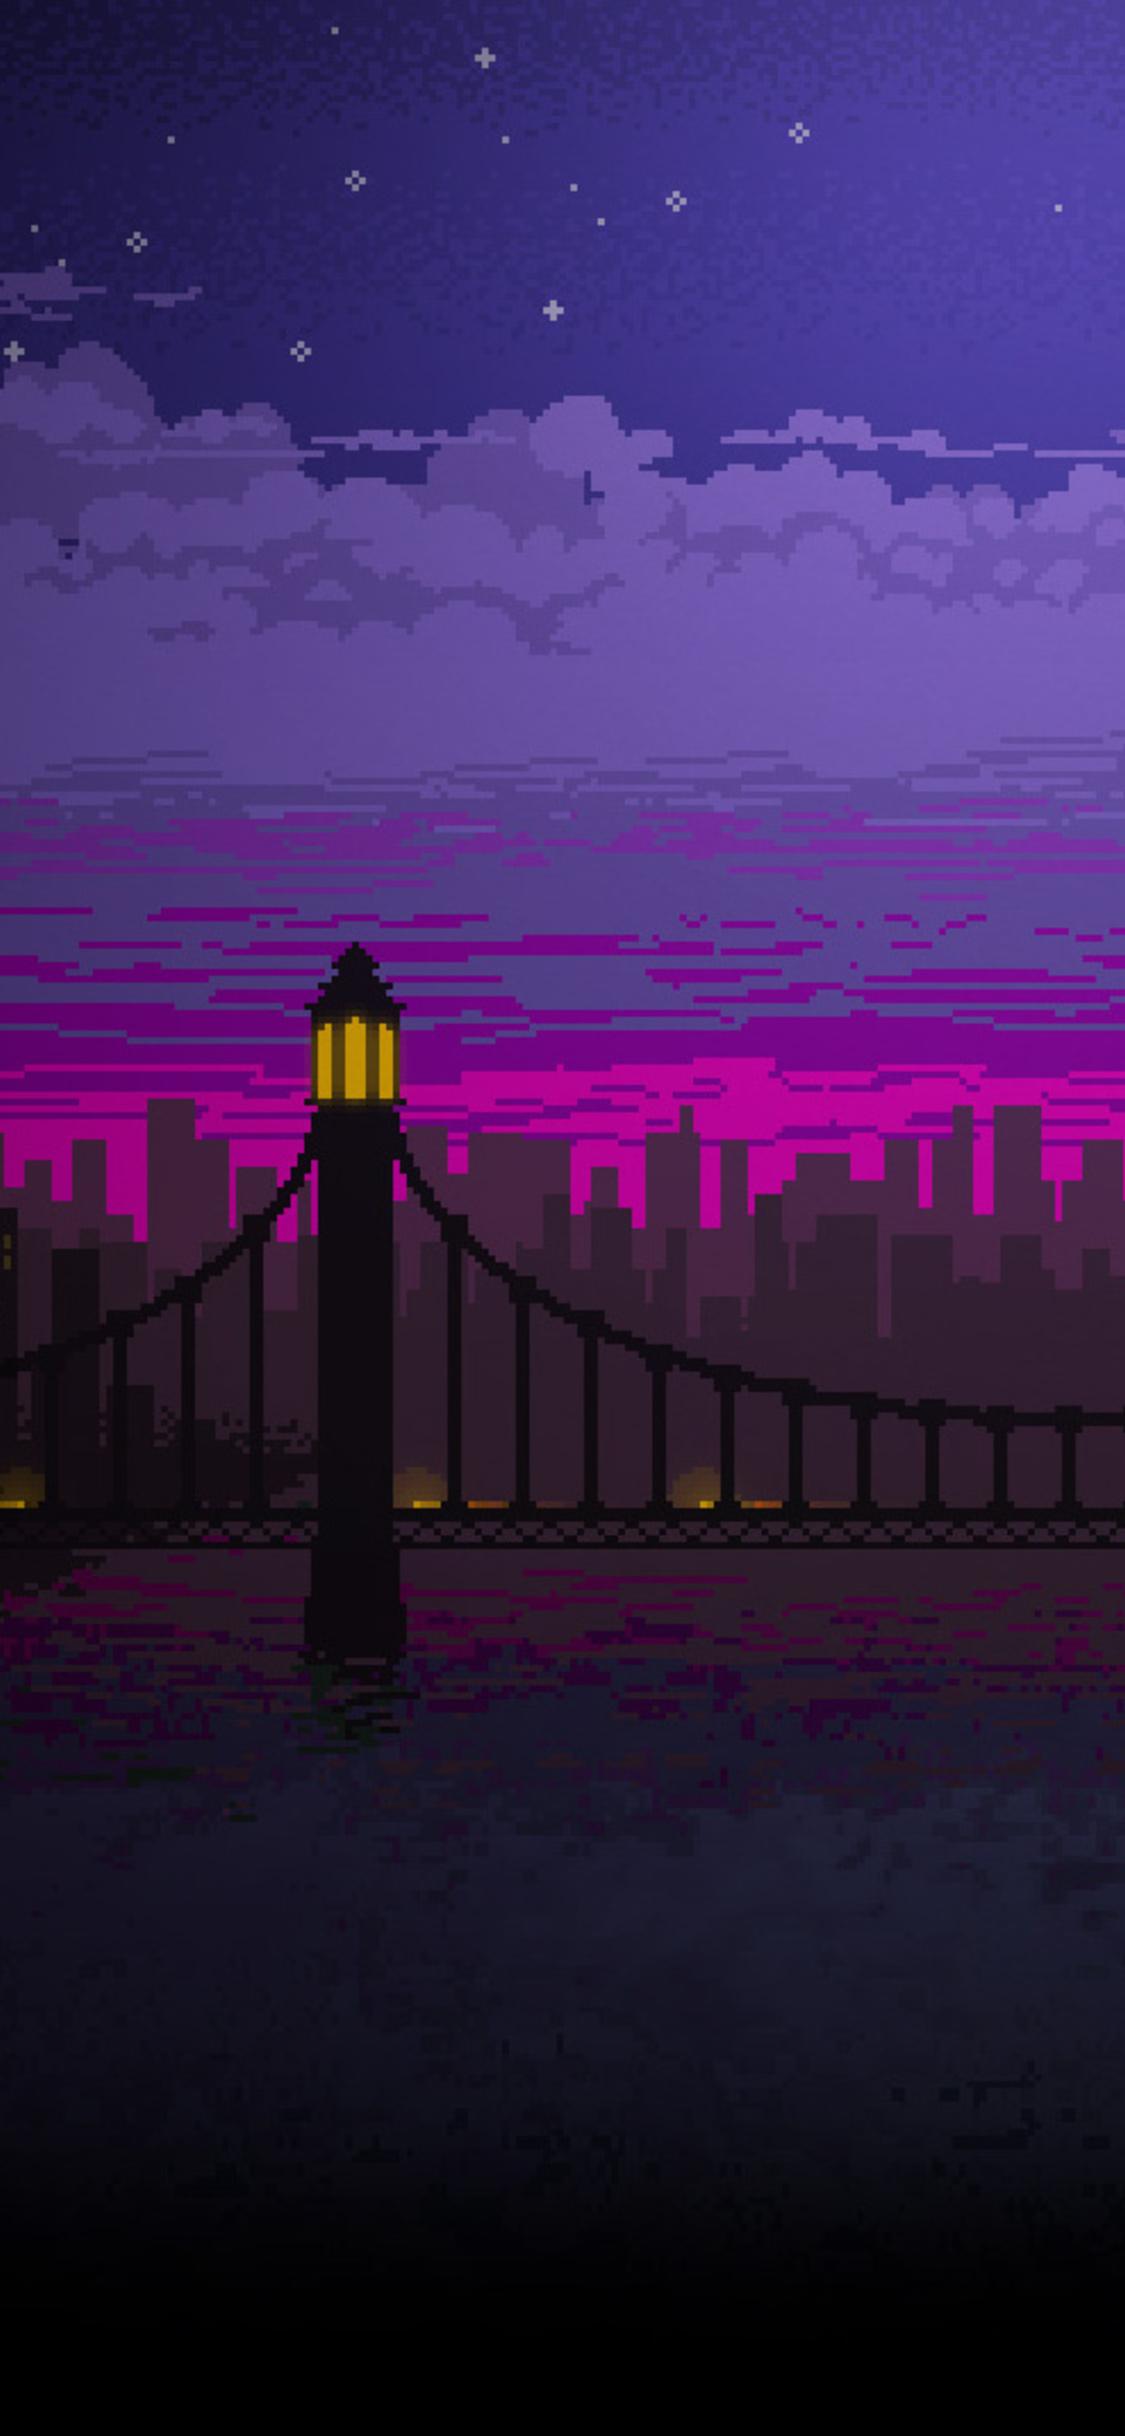 1125x2436 Pixel Art Bridge Night Iphone Xs Iphone 10 Iphone X Hd 4k